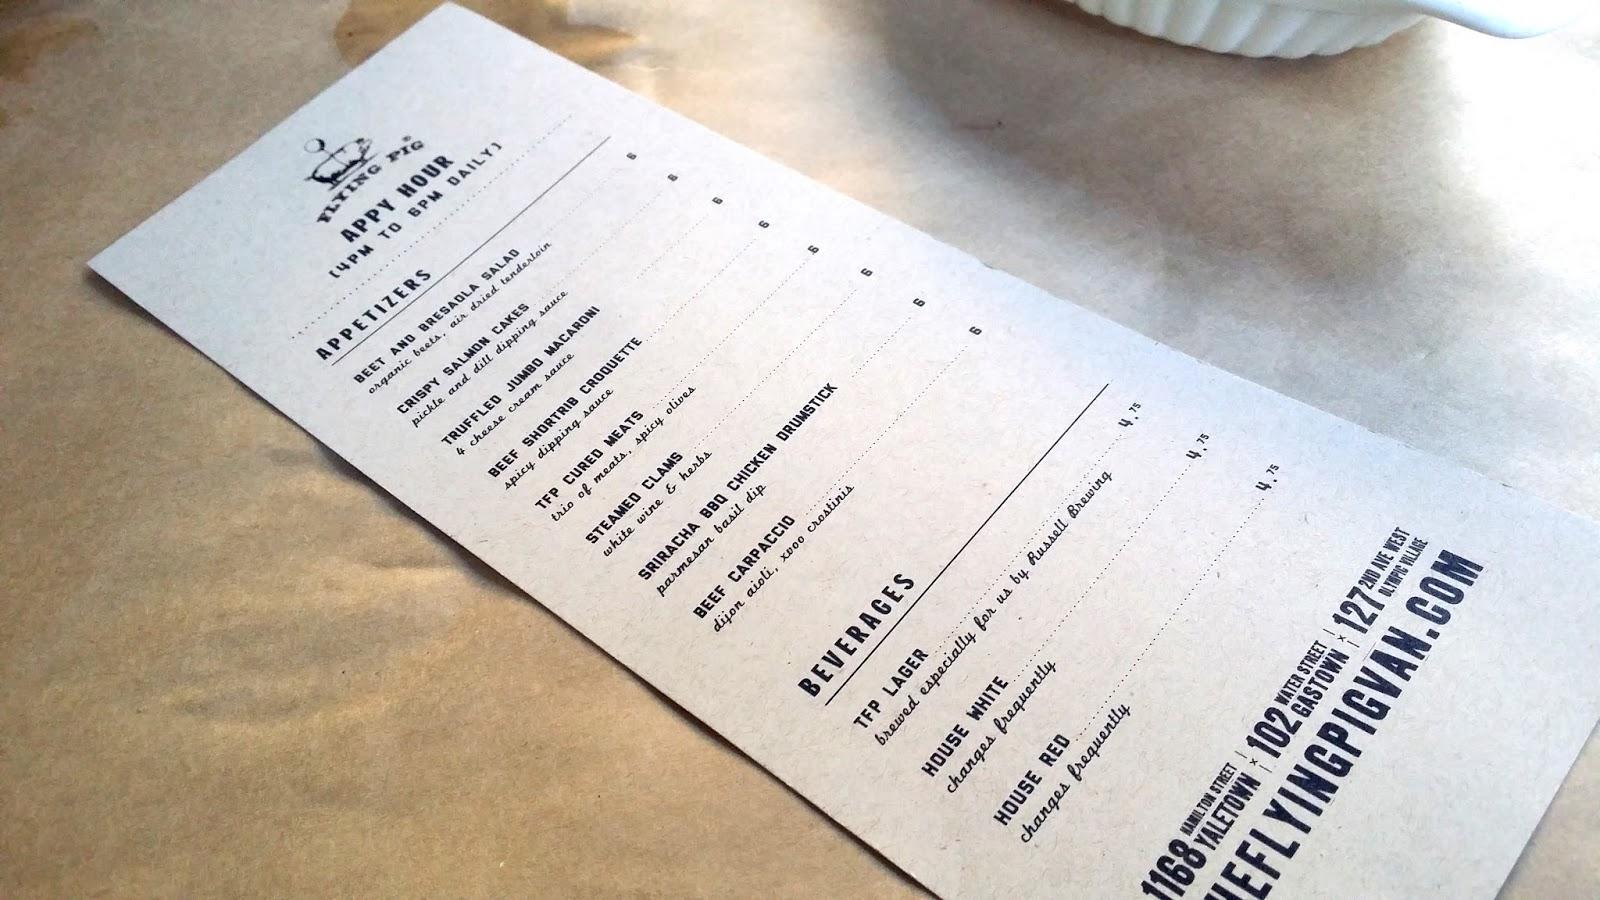 Sophia Eats: The Flying Pig (in Gastown): \'Appy Hour, $6 per Dish